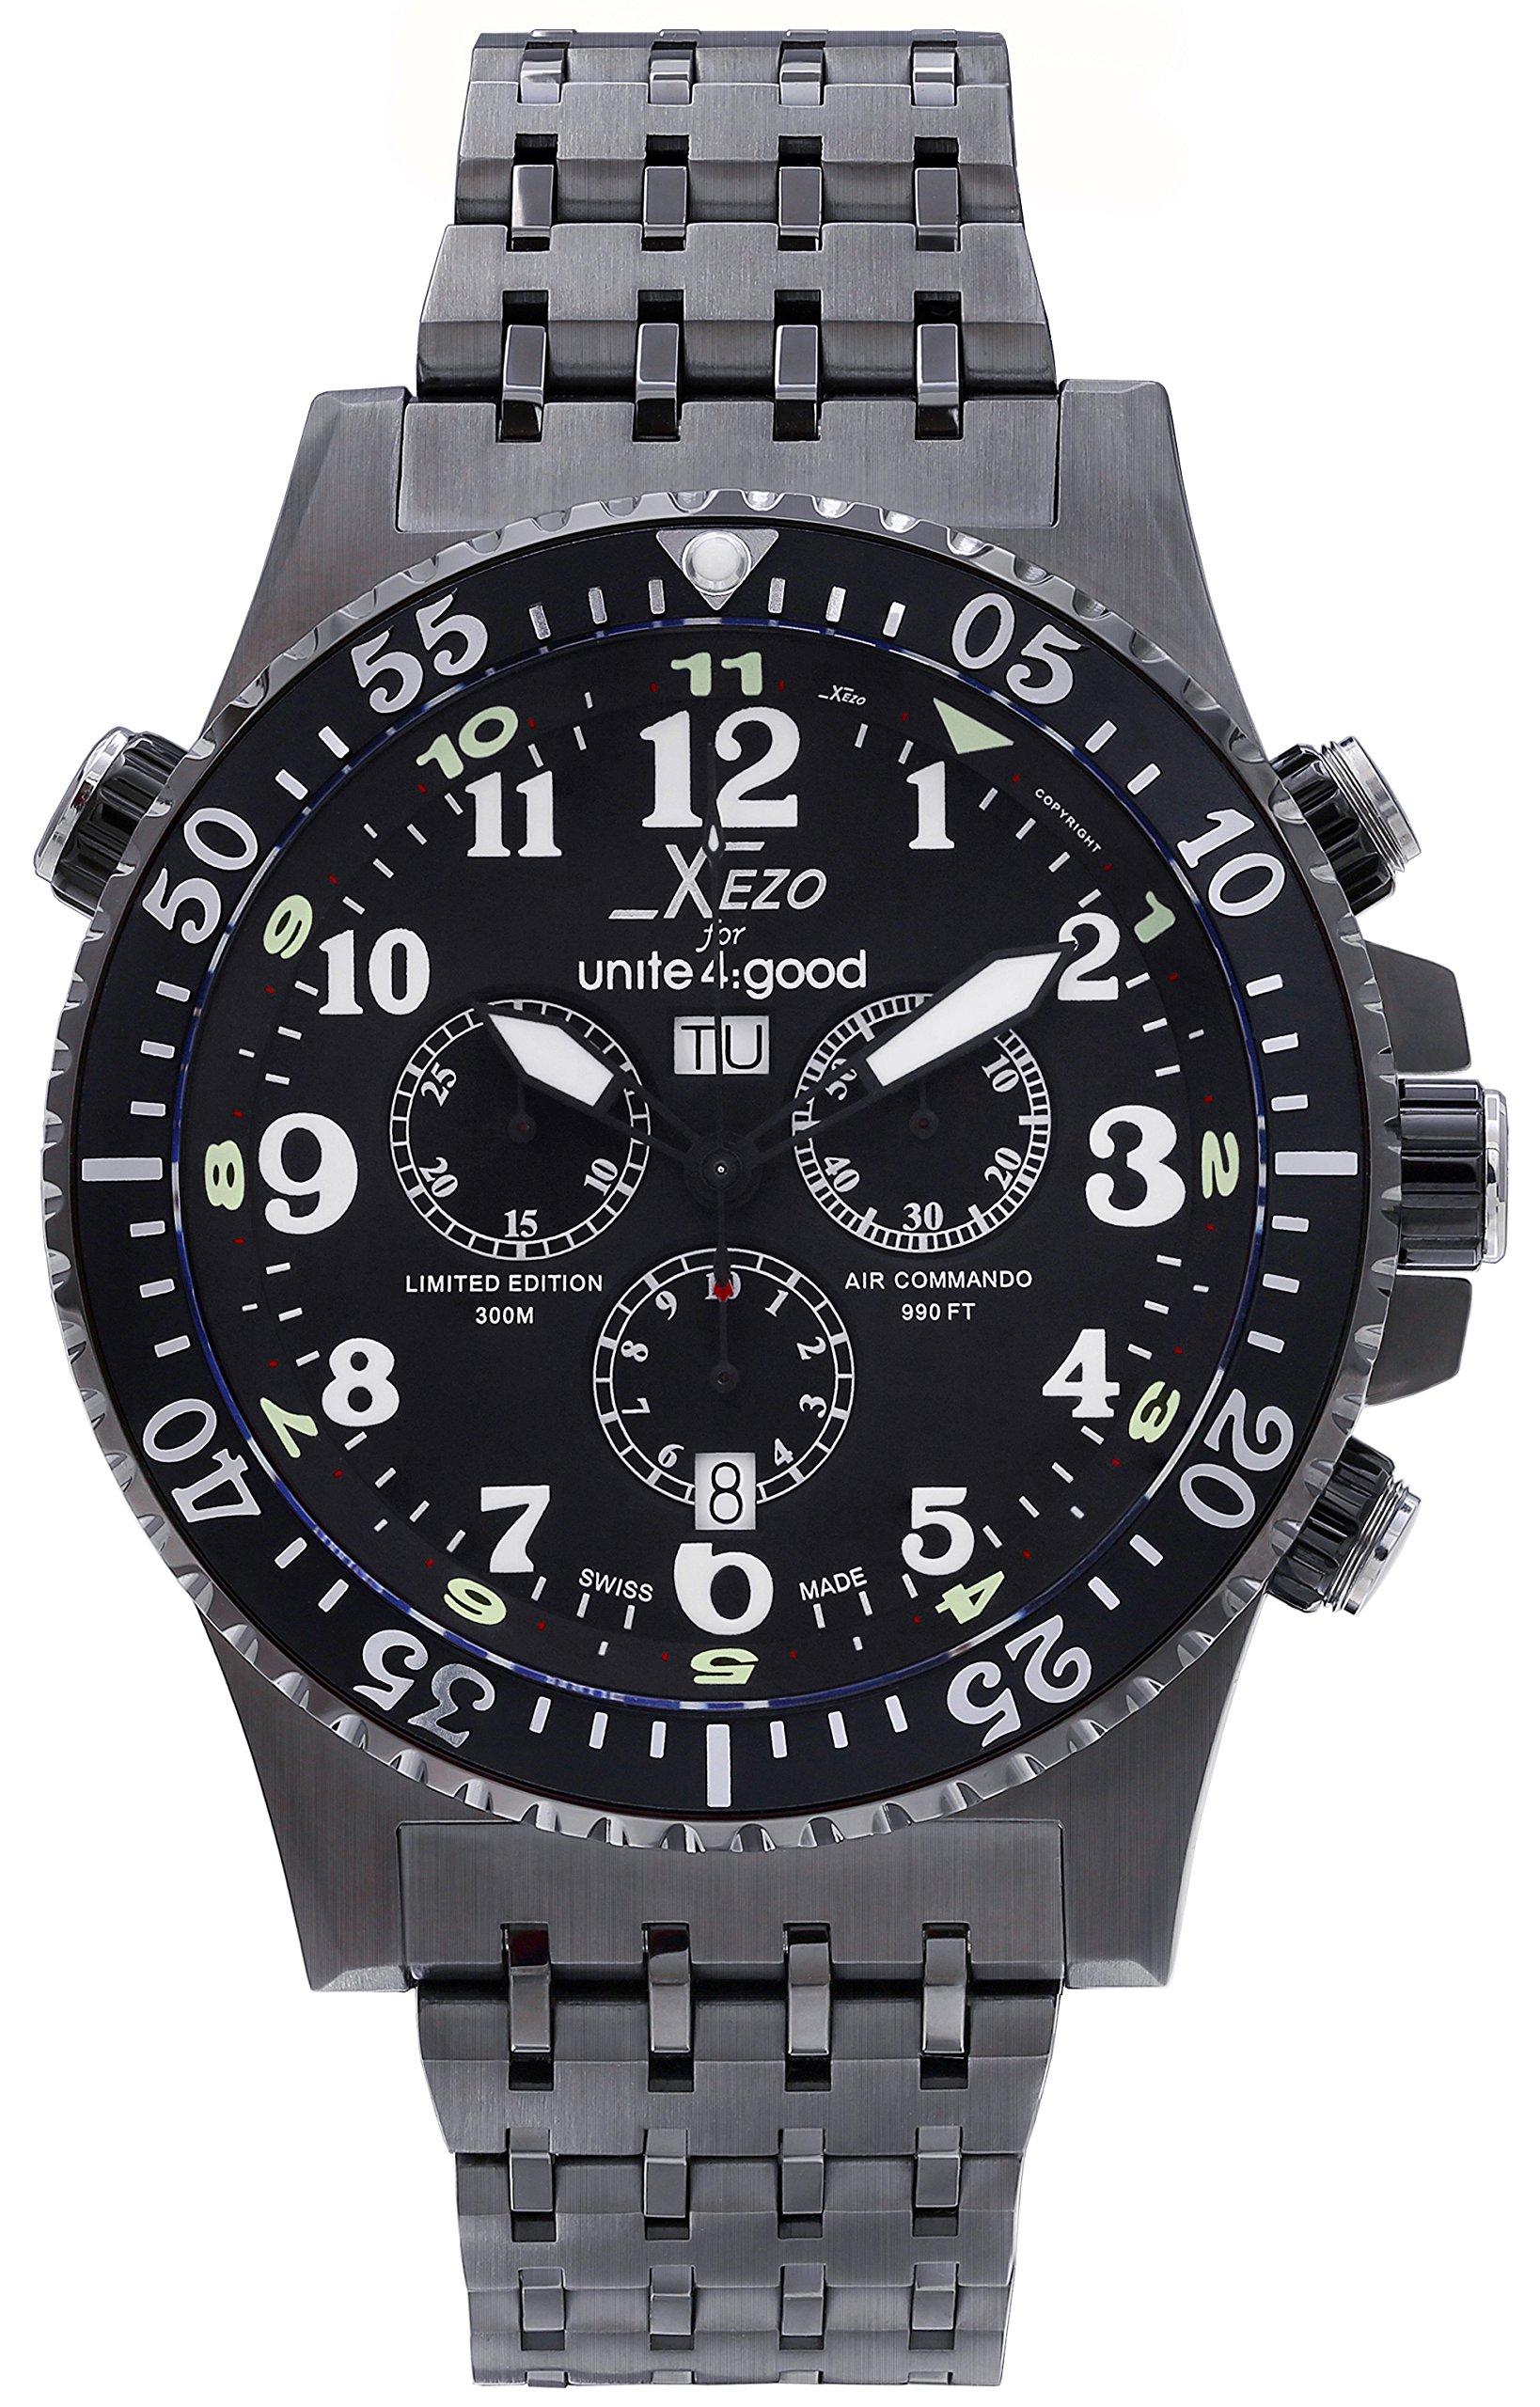 Xezo Men's Air Commando Swiss-Quartz Pilots Diver Chronograph Wrist Watches, Black Gun Metal